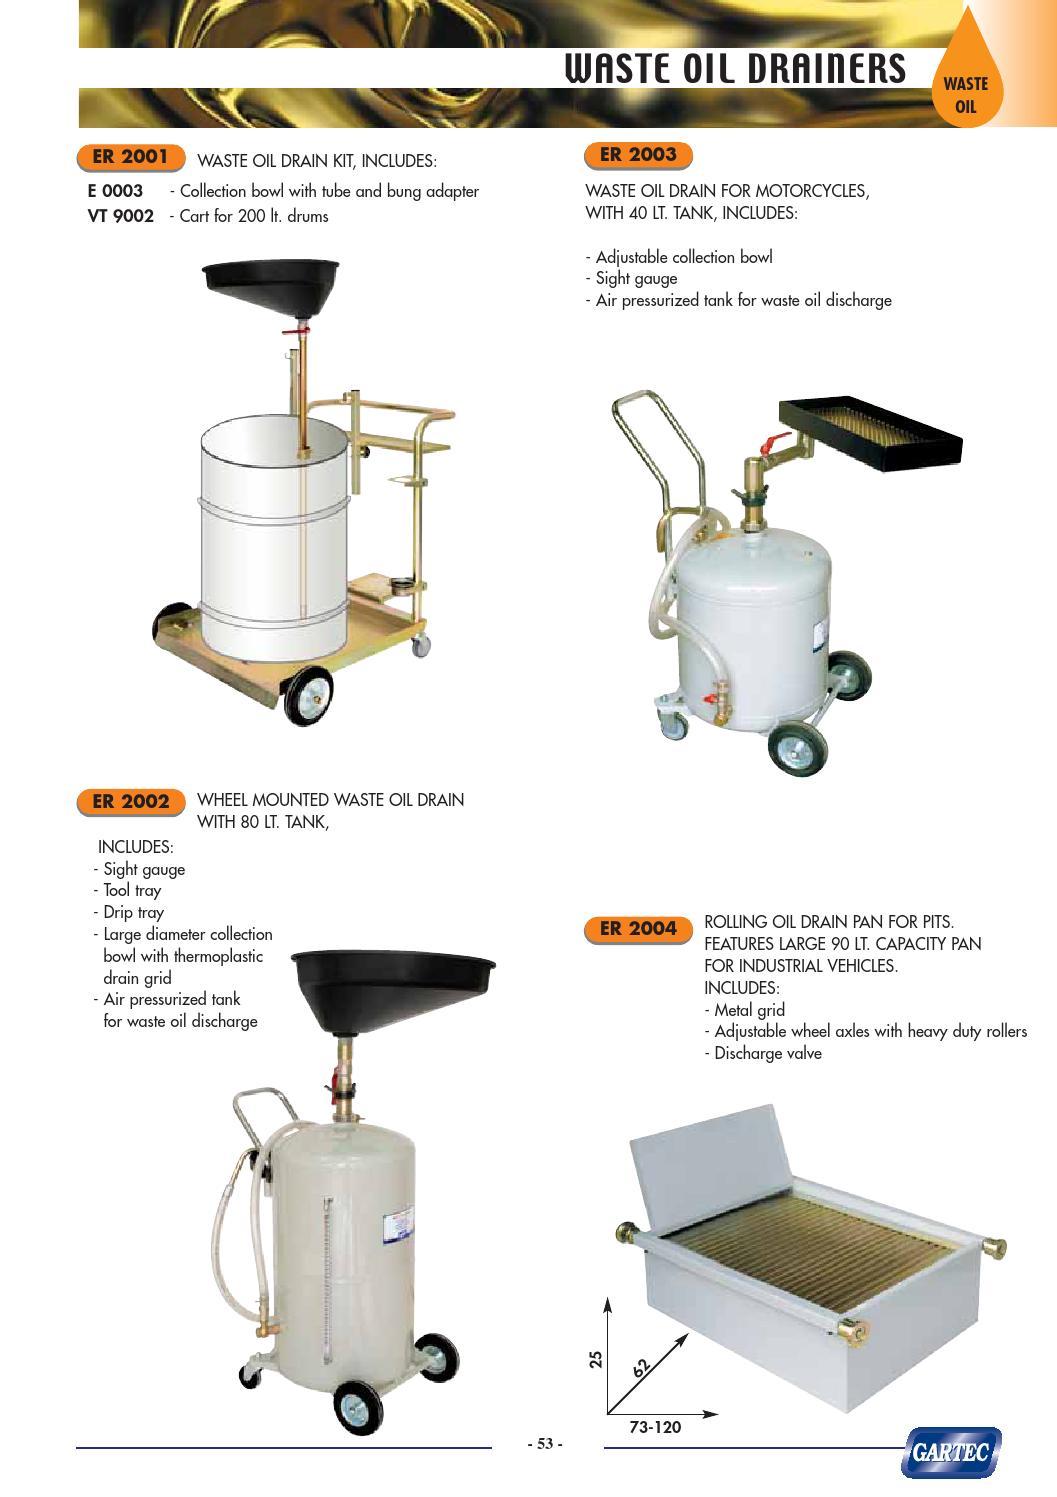 Gartec Catalogus By Chrisel Fluidtechnics Page 55 Issuu